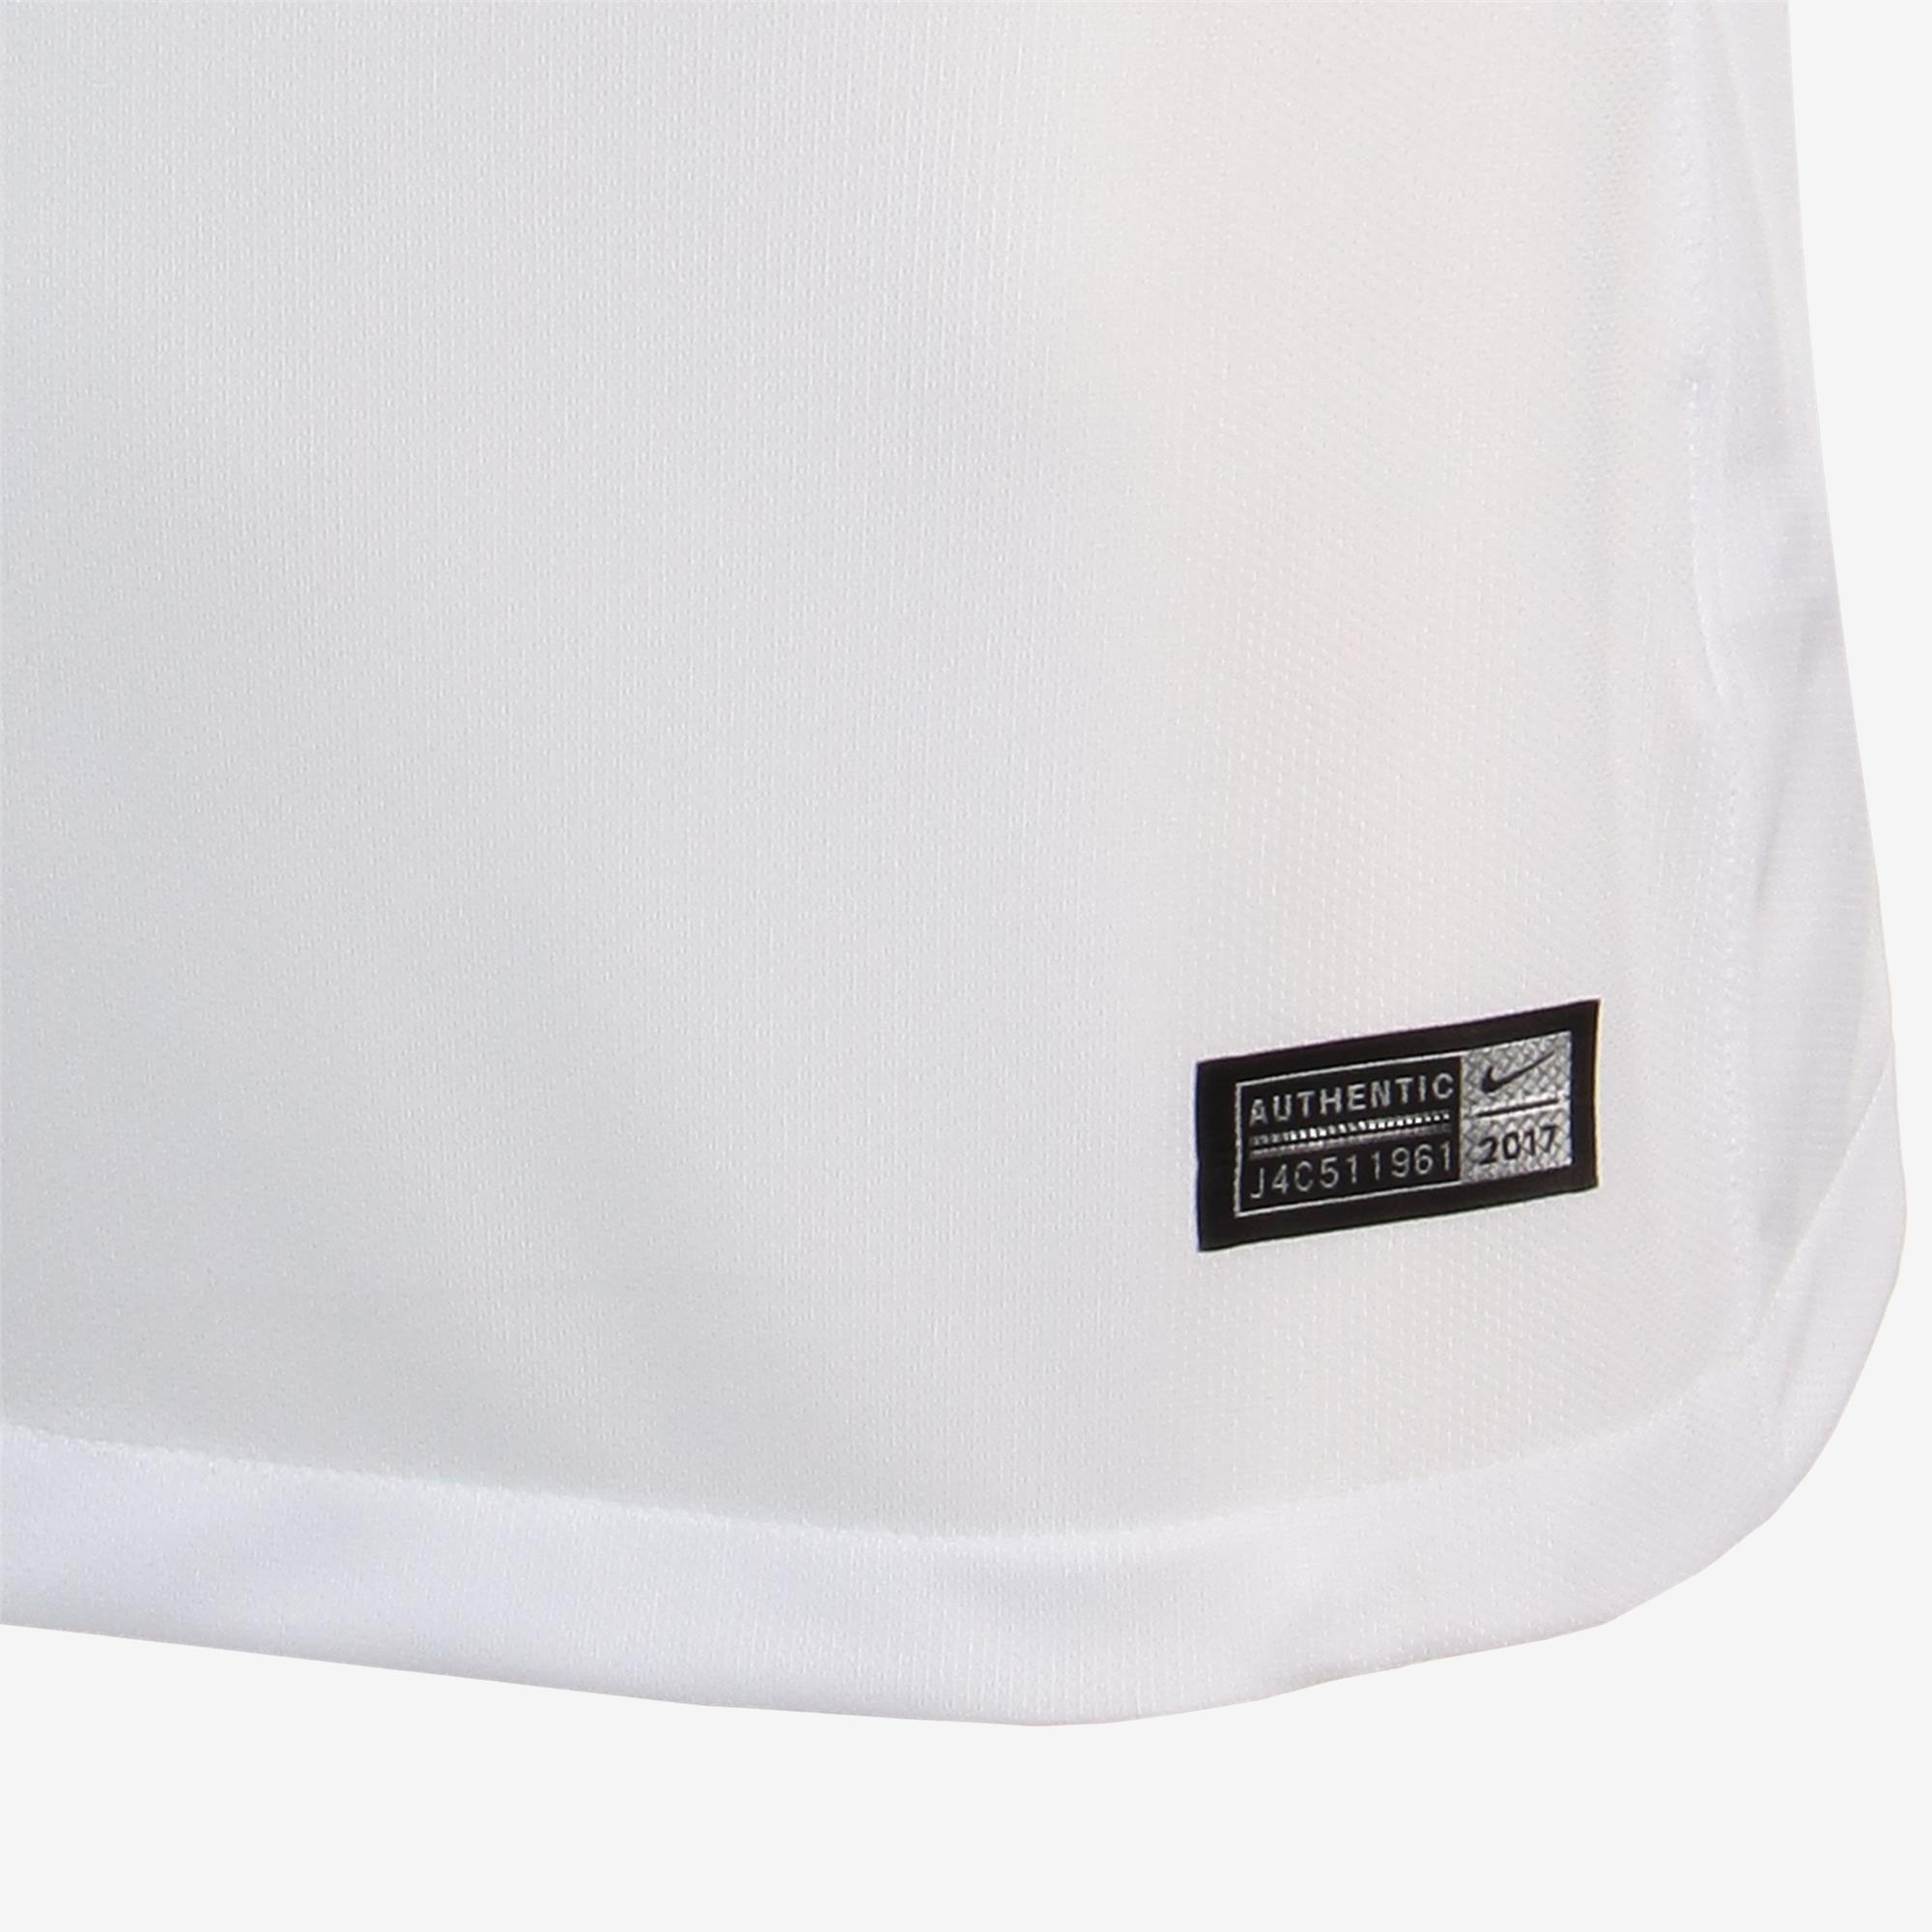 d5e2e3b248967 ... Camiseta Feminina Corinthians i 17 18 S nº Dri-fit Torcedor Oficial -